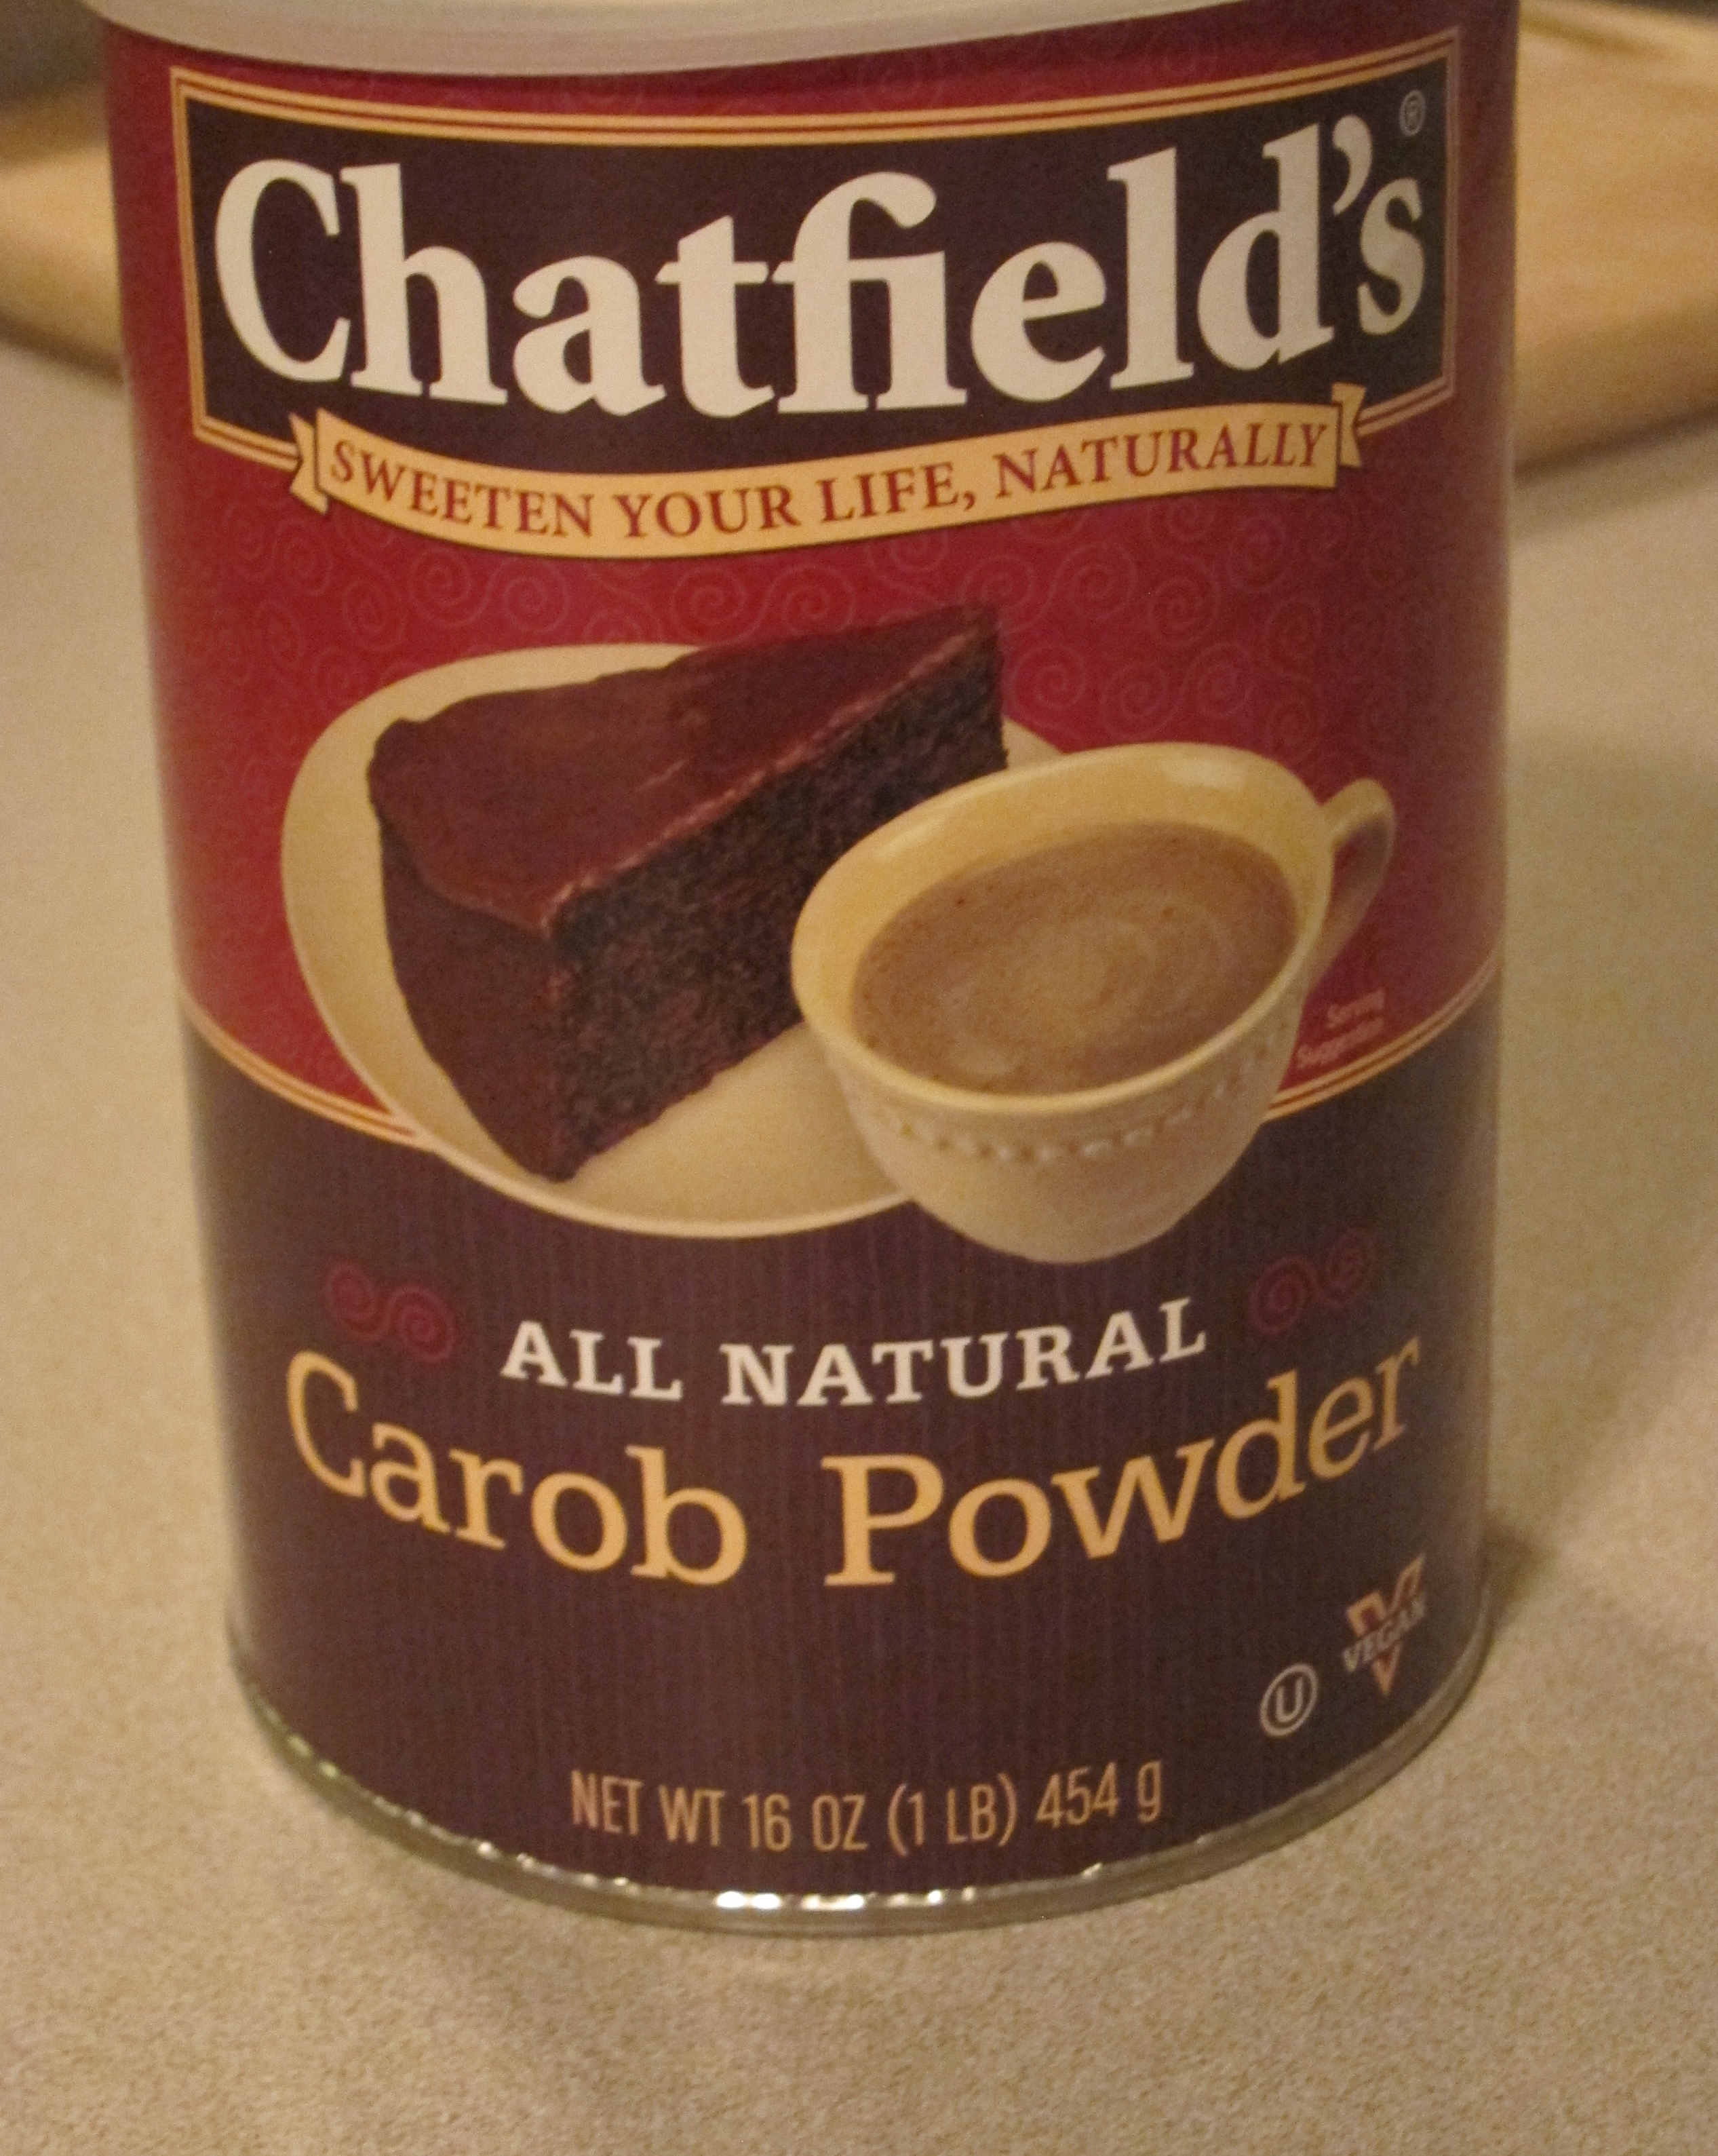 Vegan Pantry: Carob vs. Cocoa | Vegan Chronicle